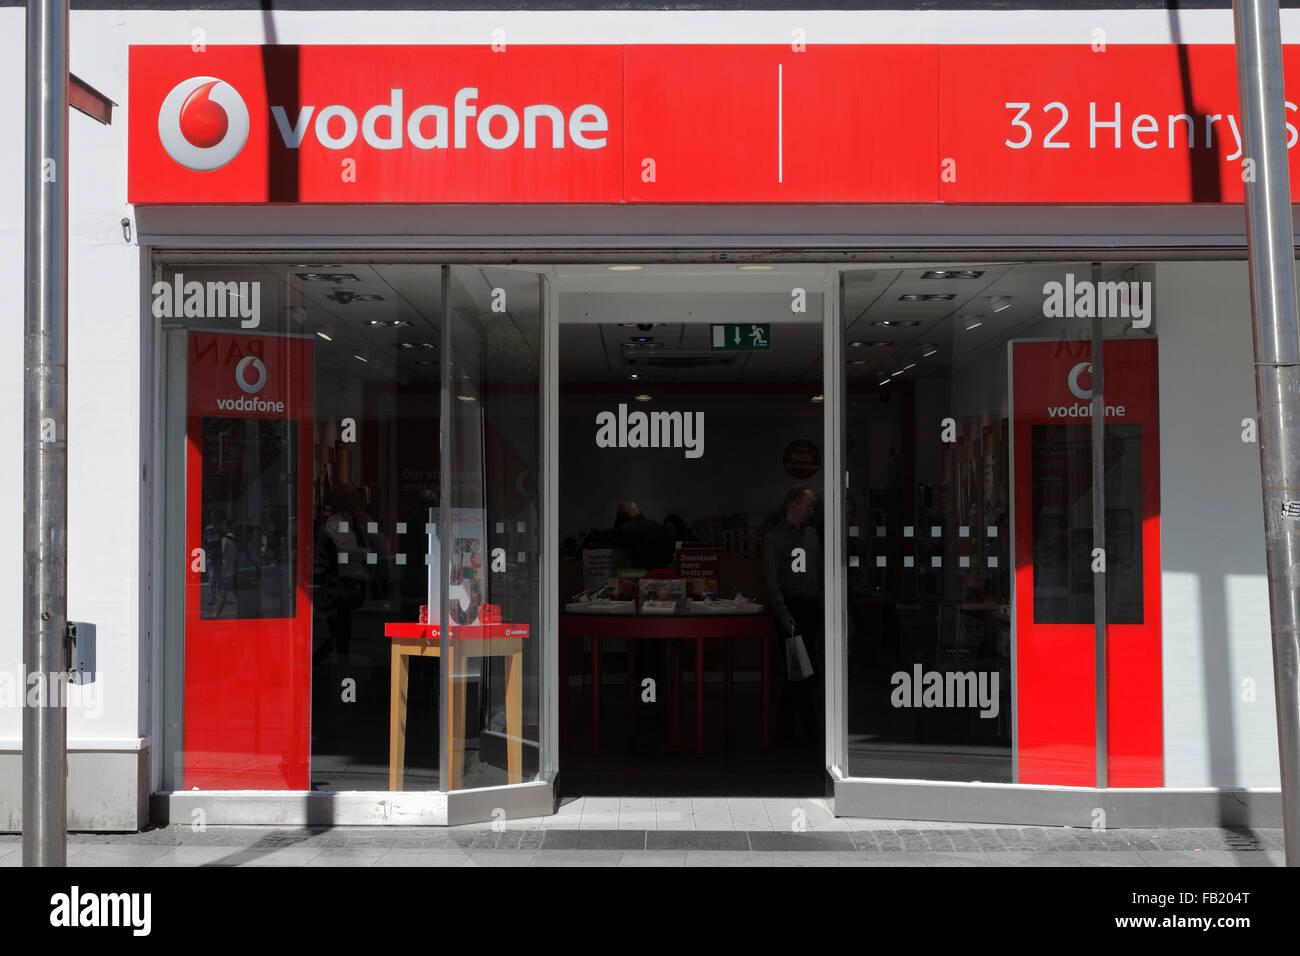 vodafone shop in Dublin, Ireland - Stock Image